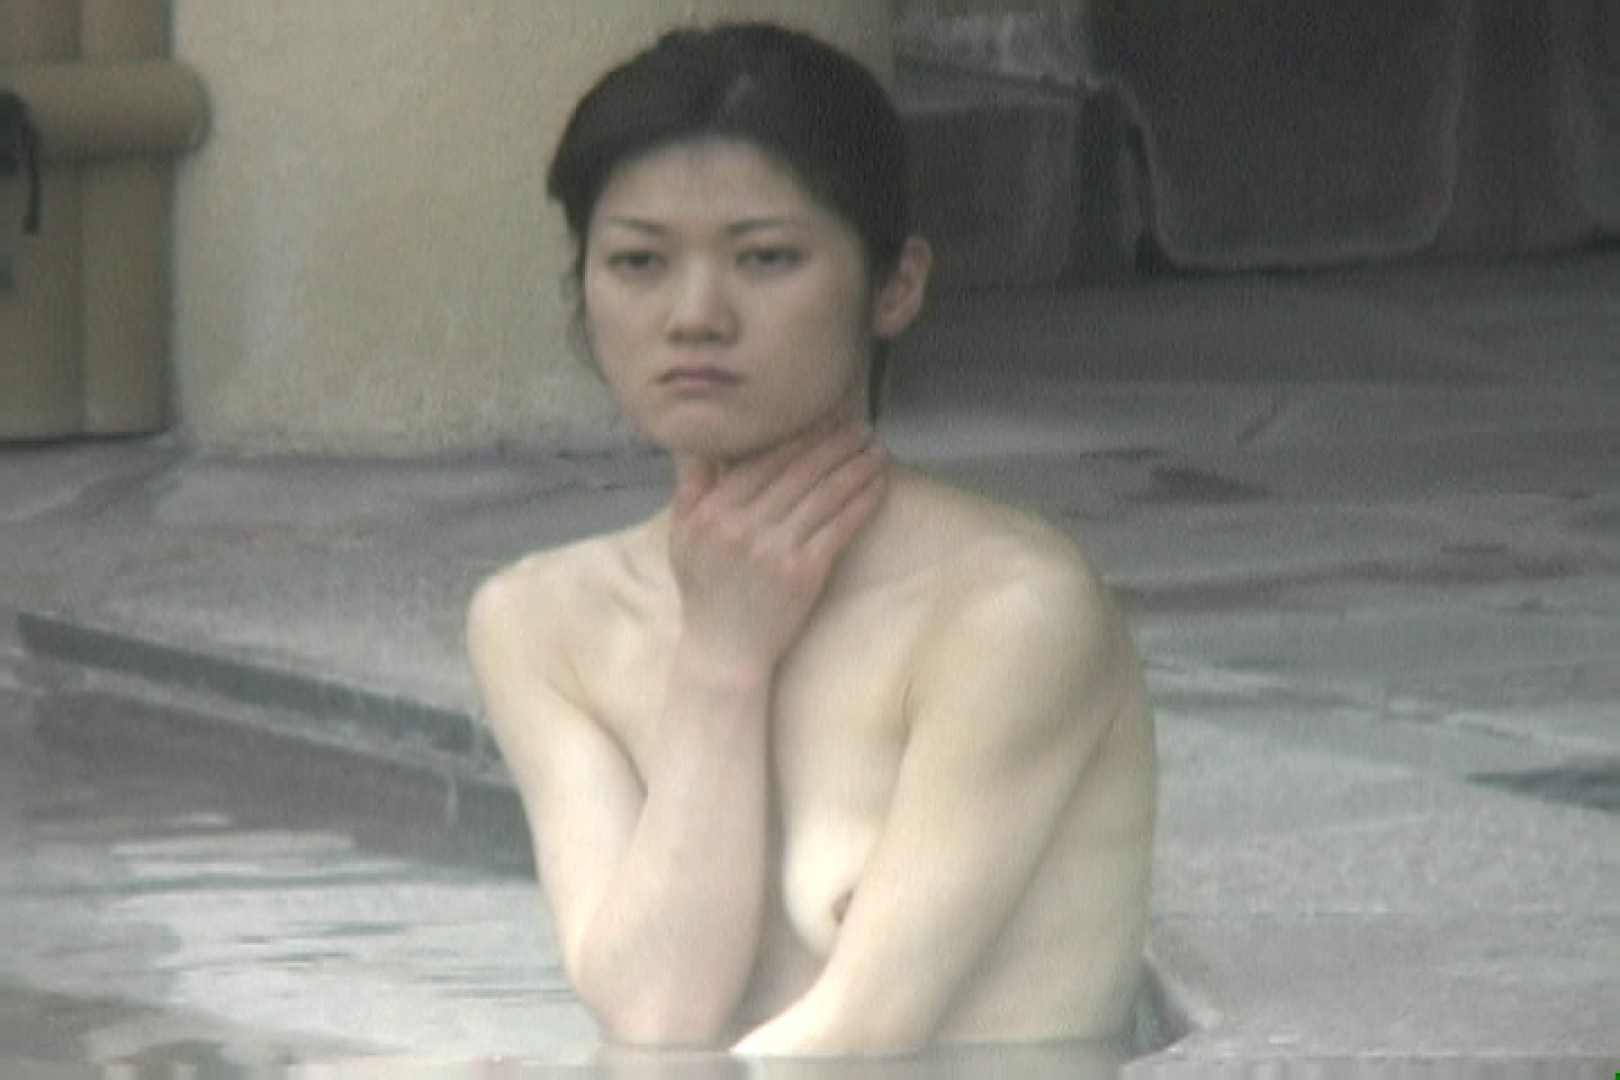 Aquaな露天風呂Vol.686 HなOL のぞき動画キャプチャ 83pic 42